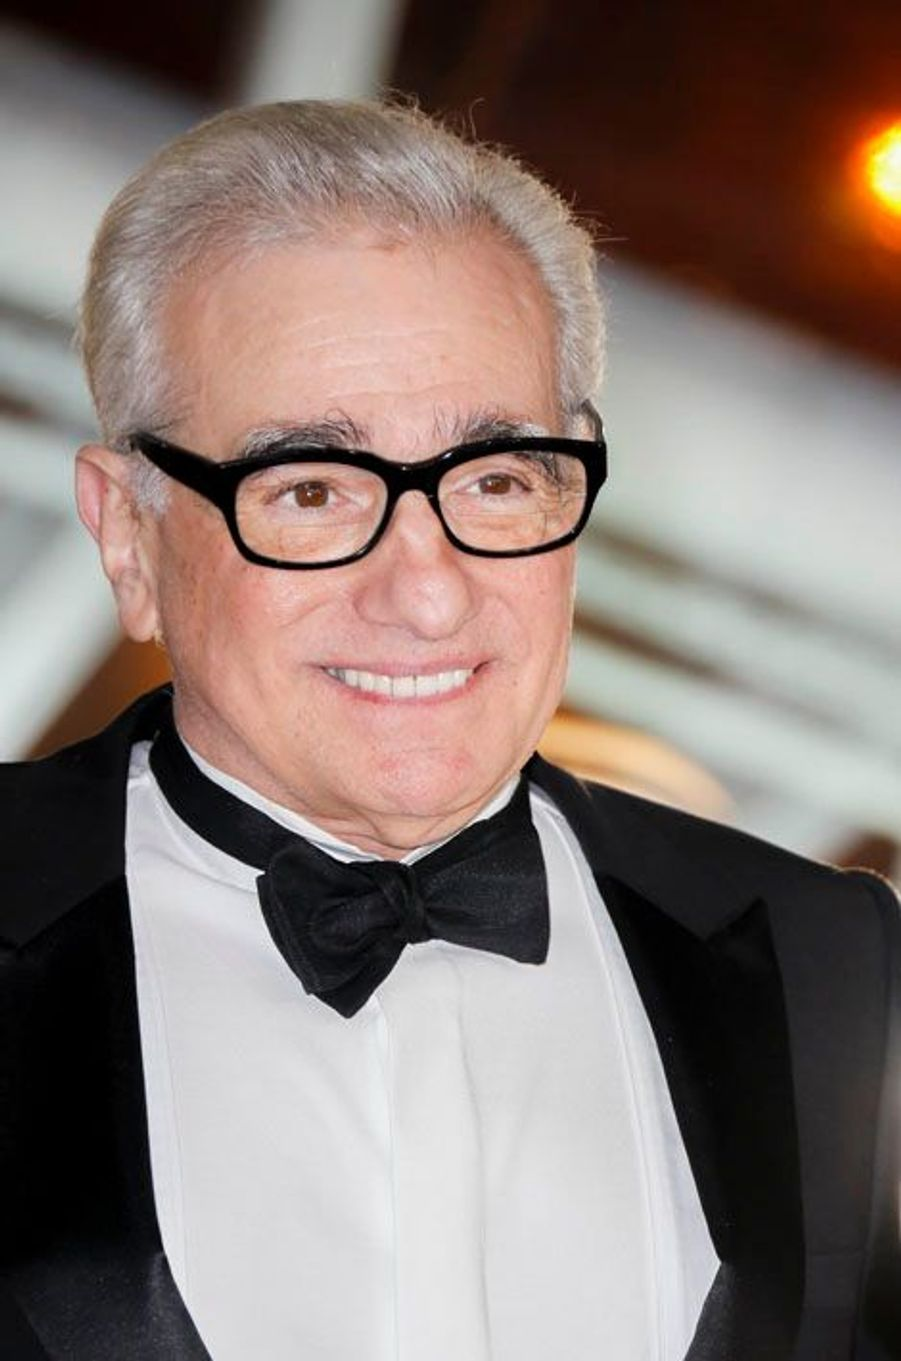 Martin Scorsese, le président du jury